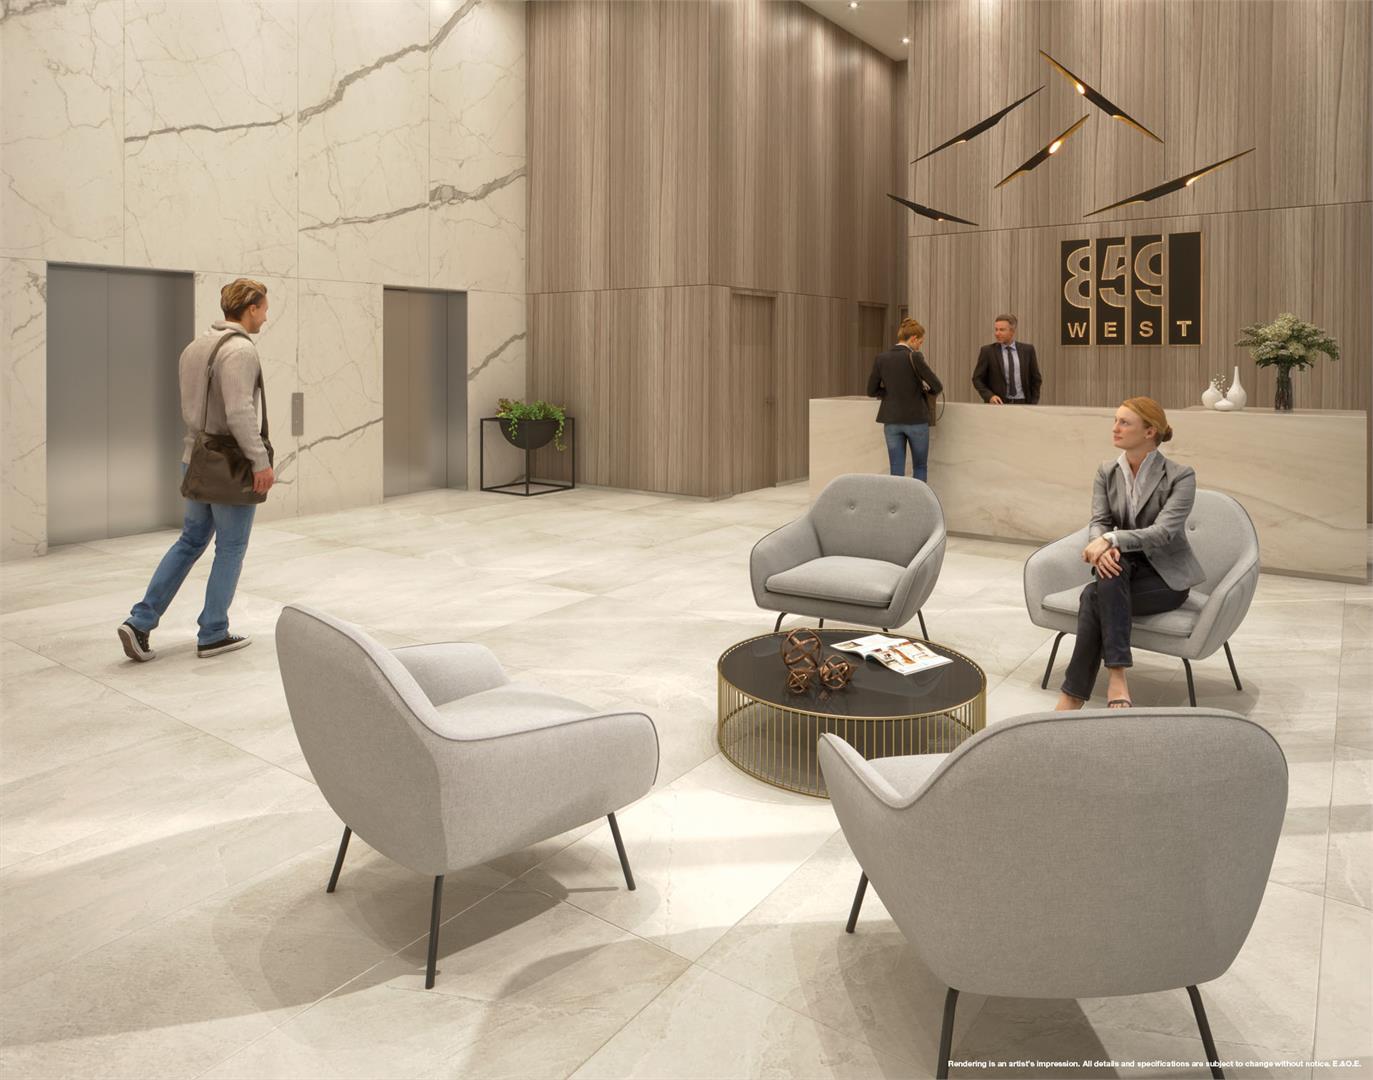 Interior photo of 859 West Condos